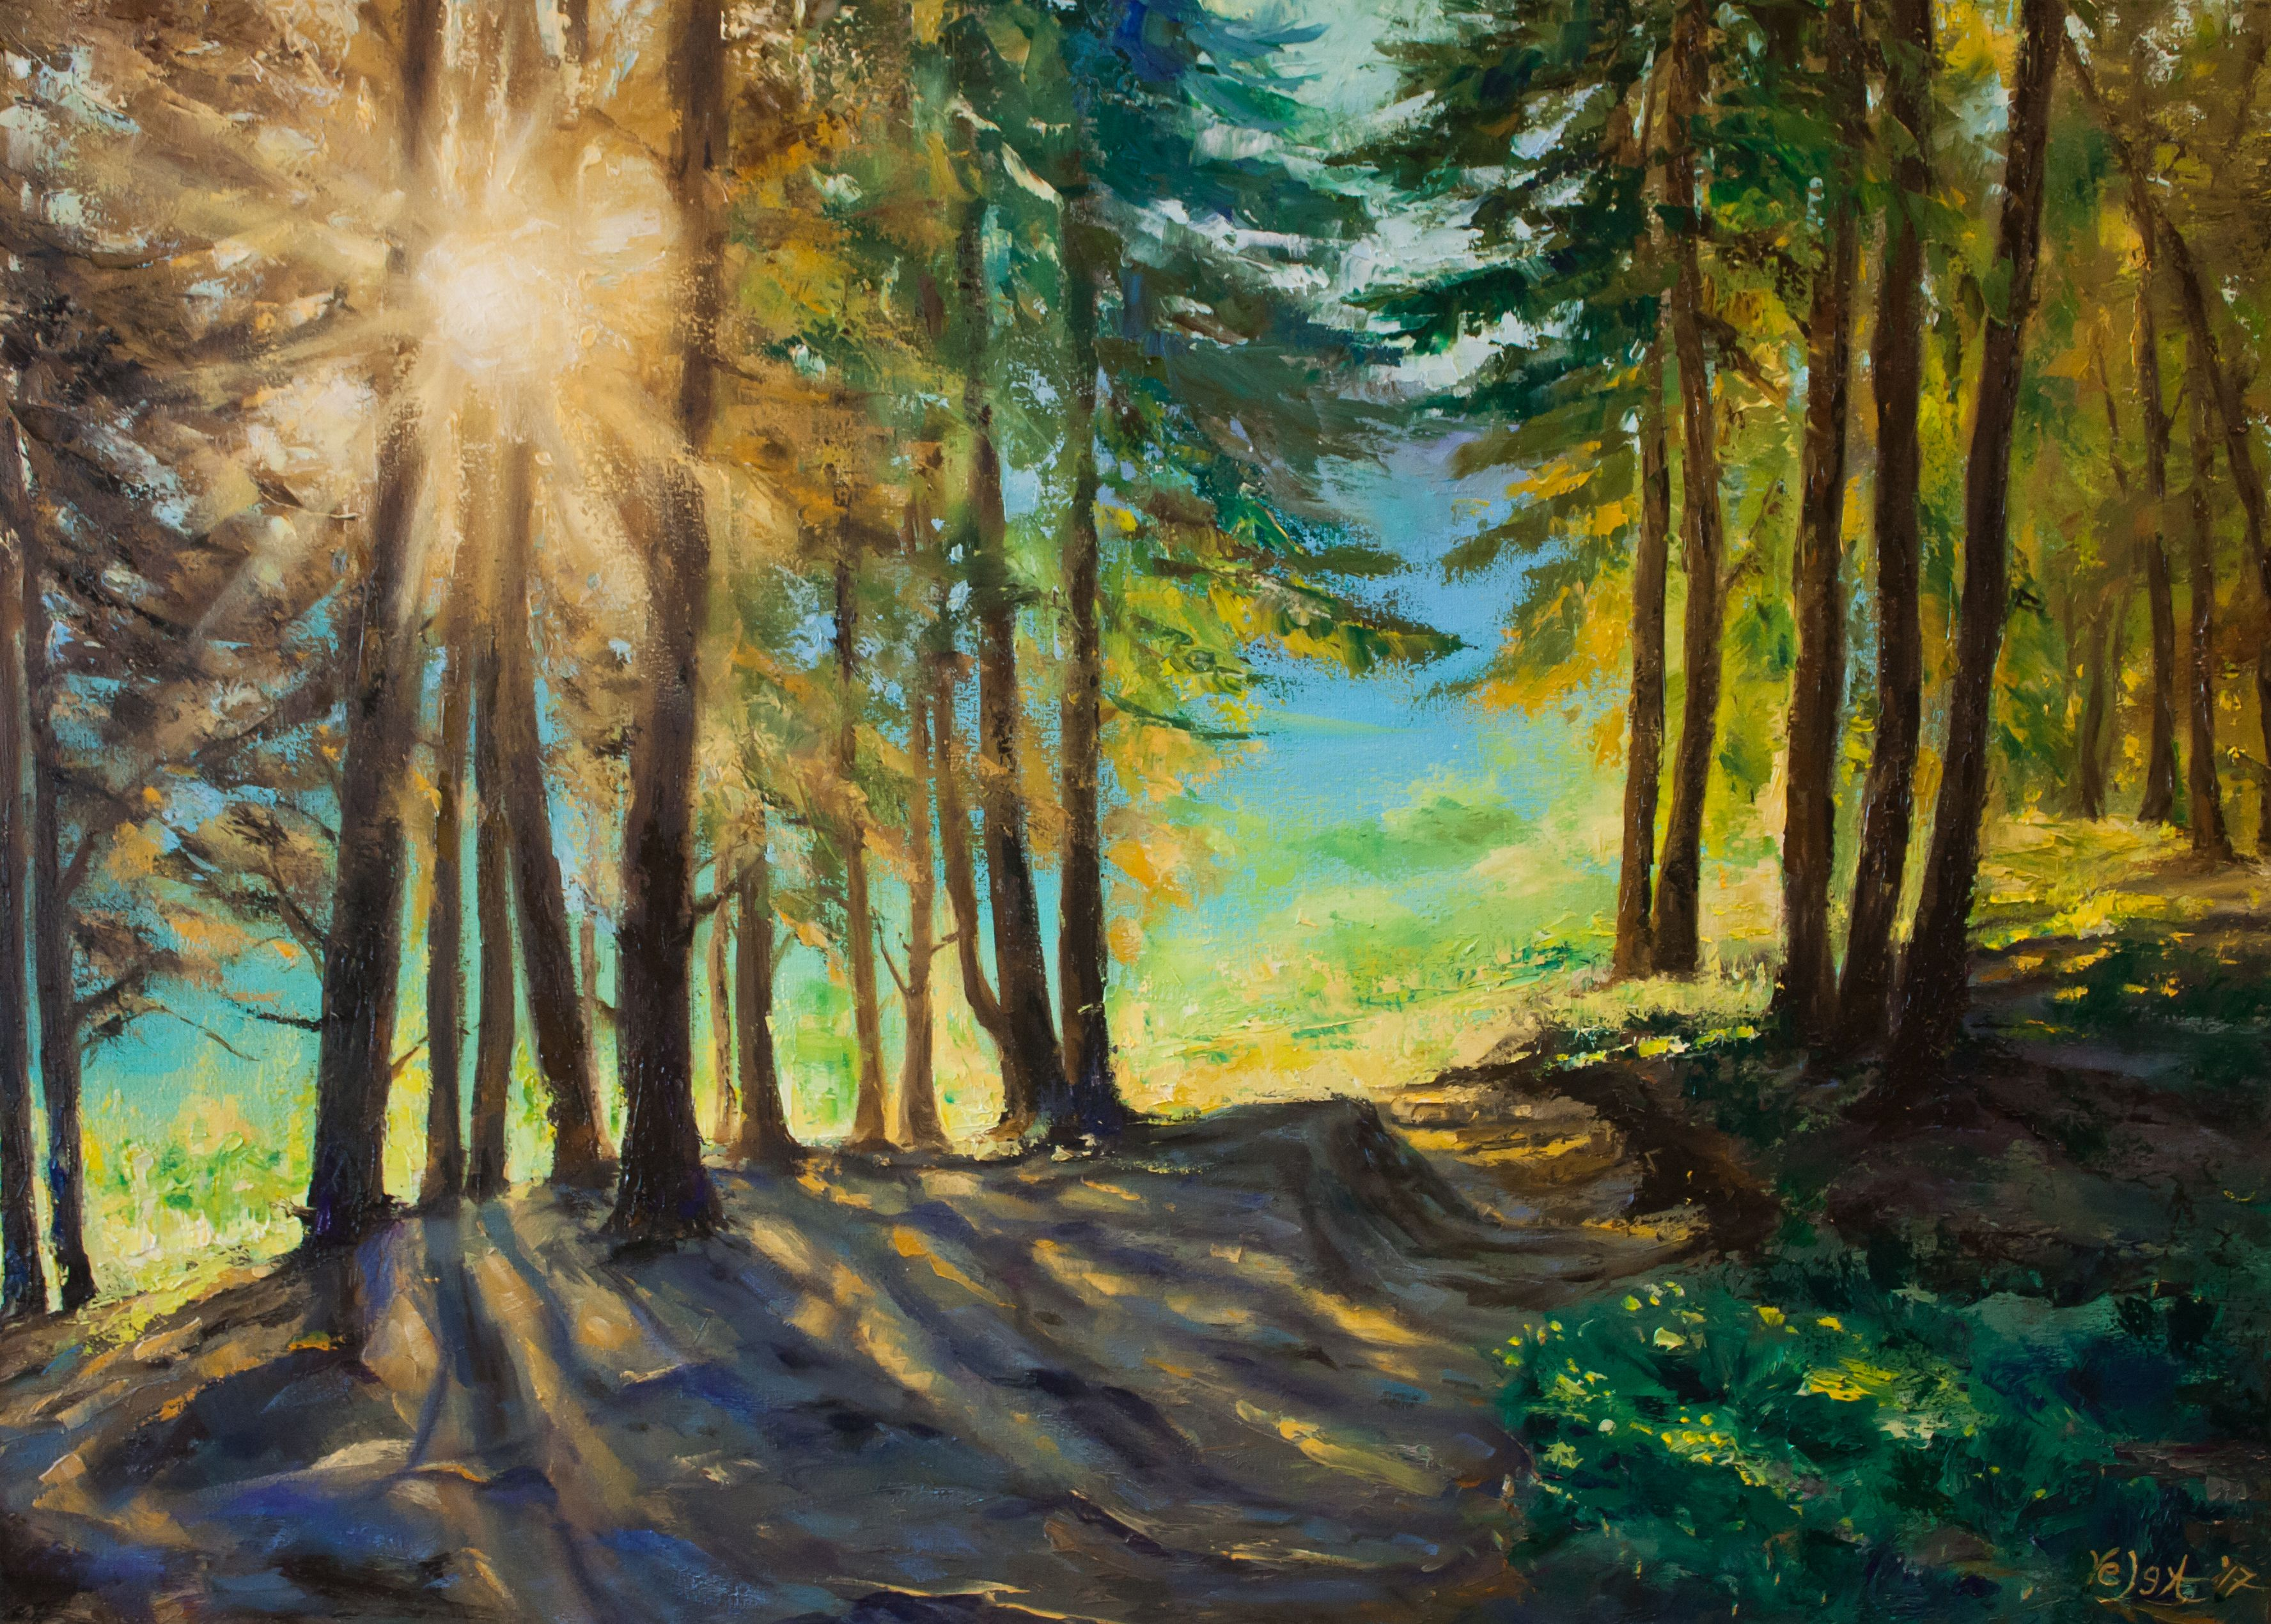 Velga Art Tetiana Kovalenko Landscapes Paintings For Sale Original Landscape Painting Photorealism Nature Paintings